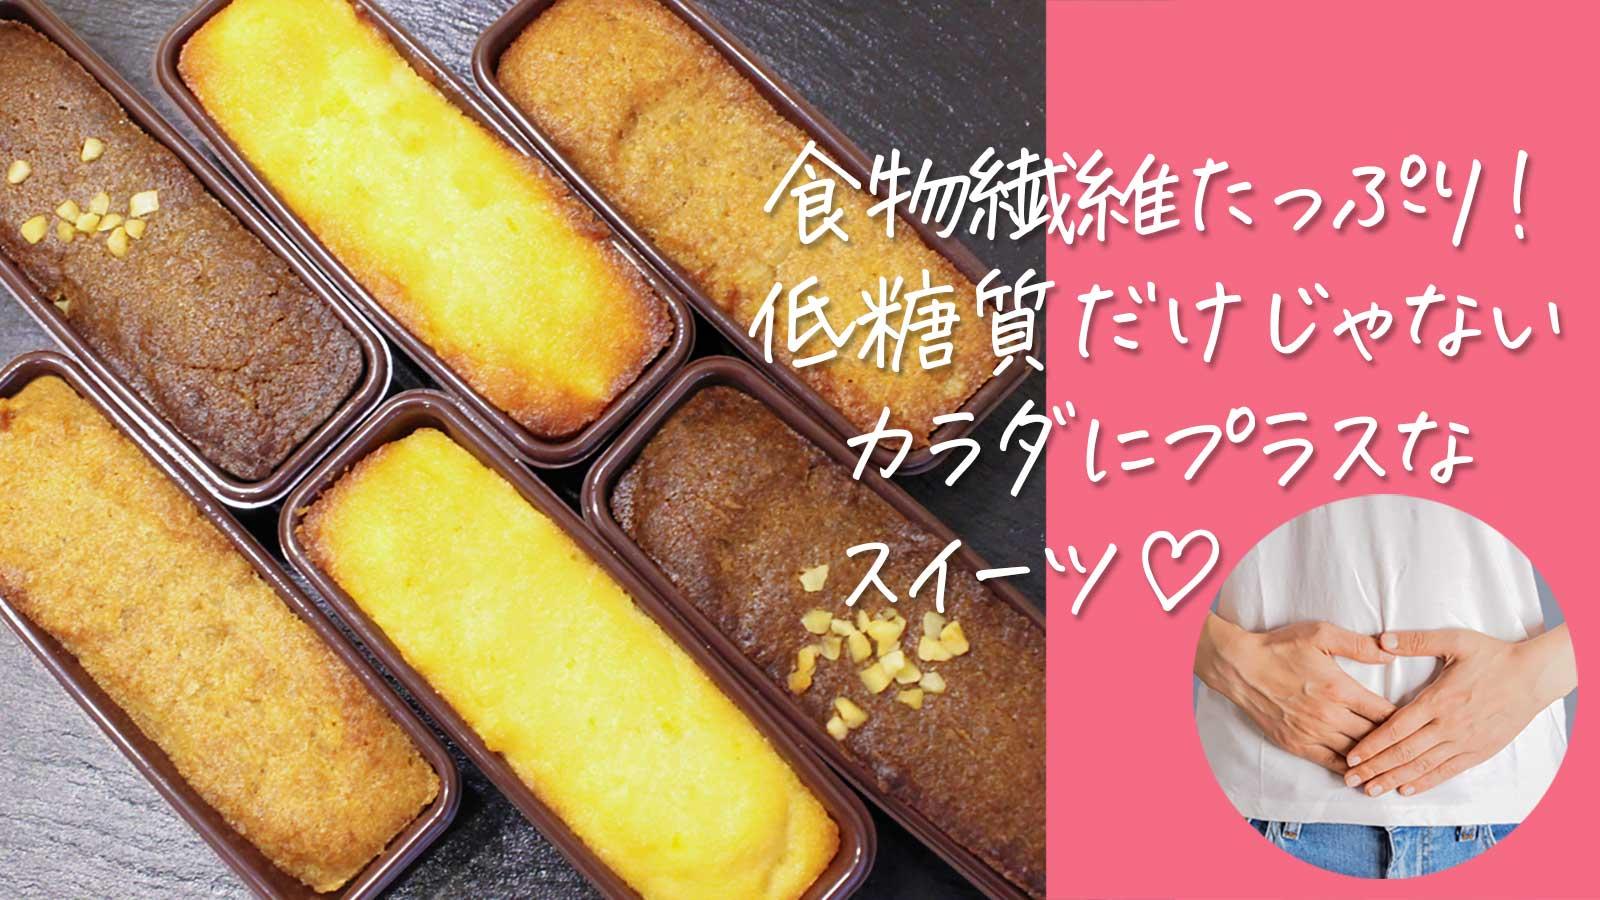 NEW低糖質ミニパウンドケーキ(オリゴ糖、食物繊維プラス)6個セット